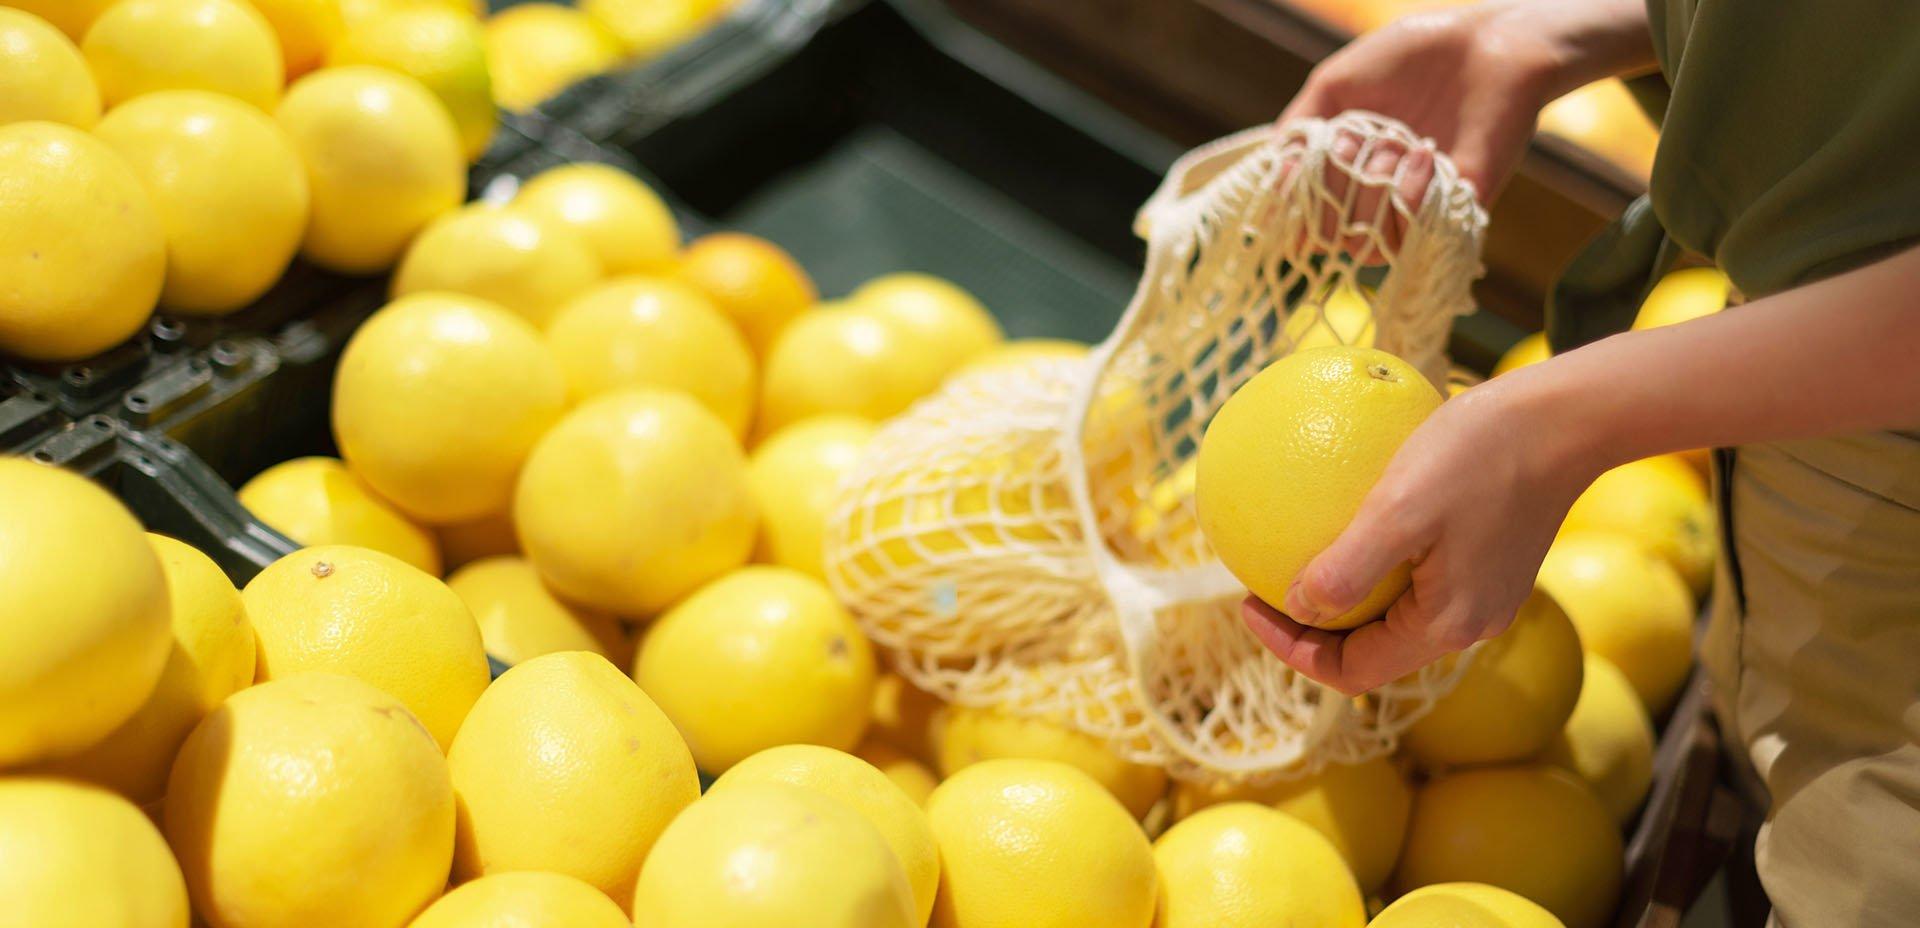 limoni al negozio